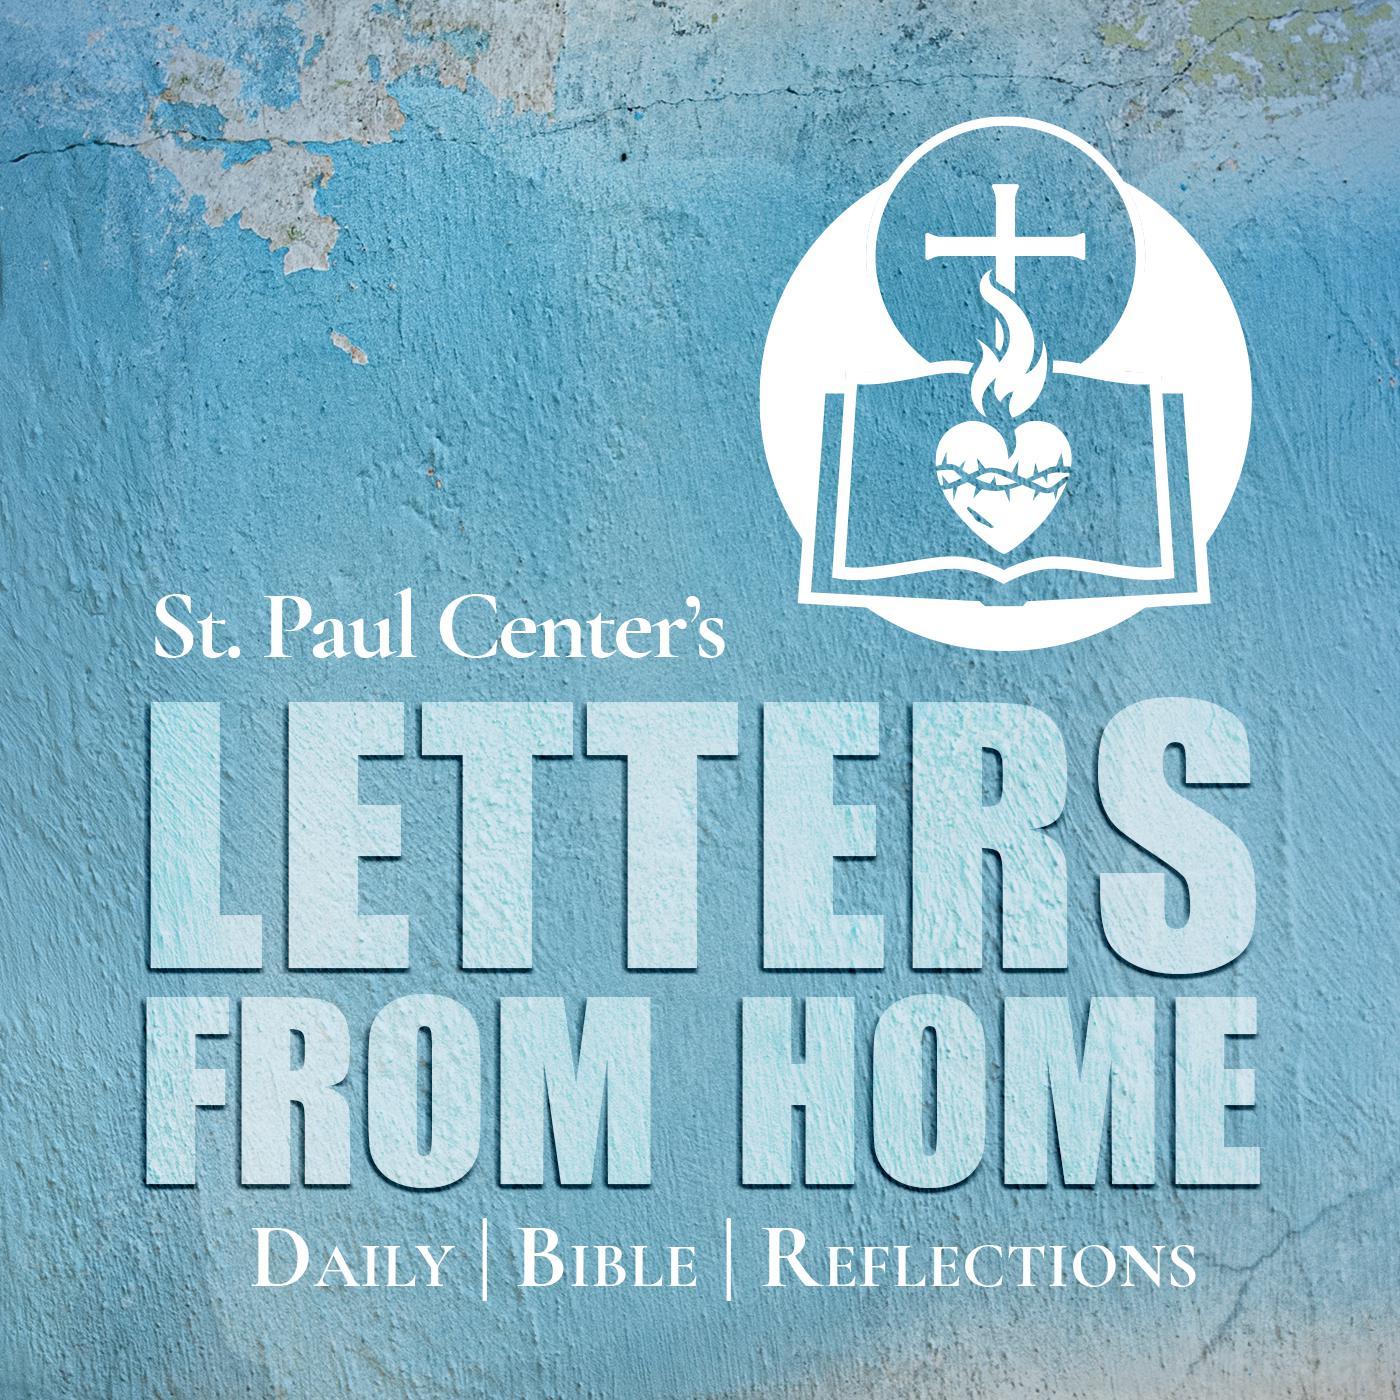 letters-from-home-st-paul-center-47wxa3s5JN0-iX1NMGpr9Vg.1400x1400